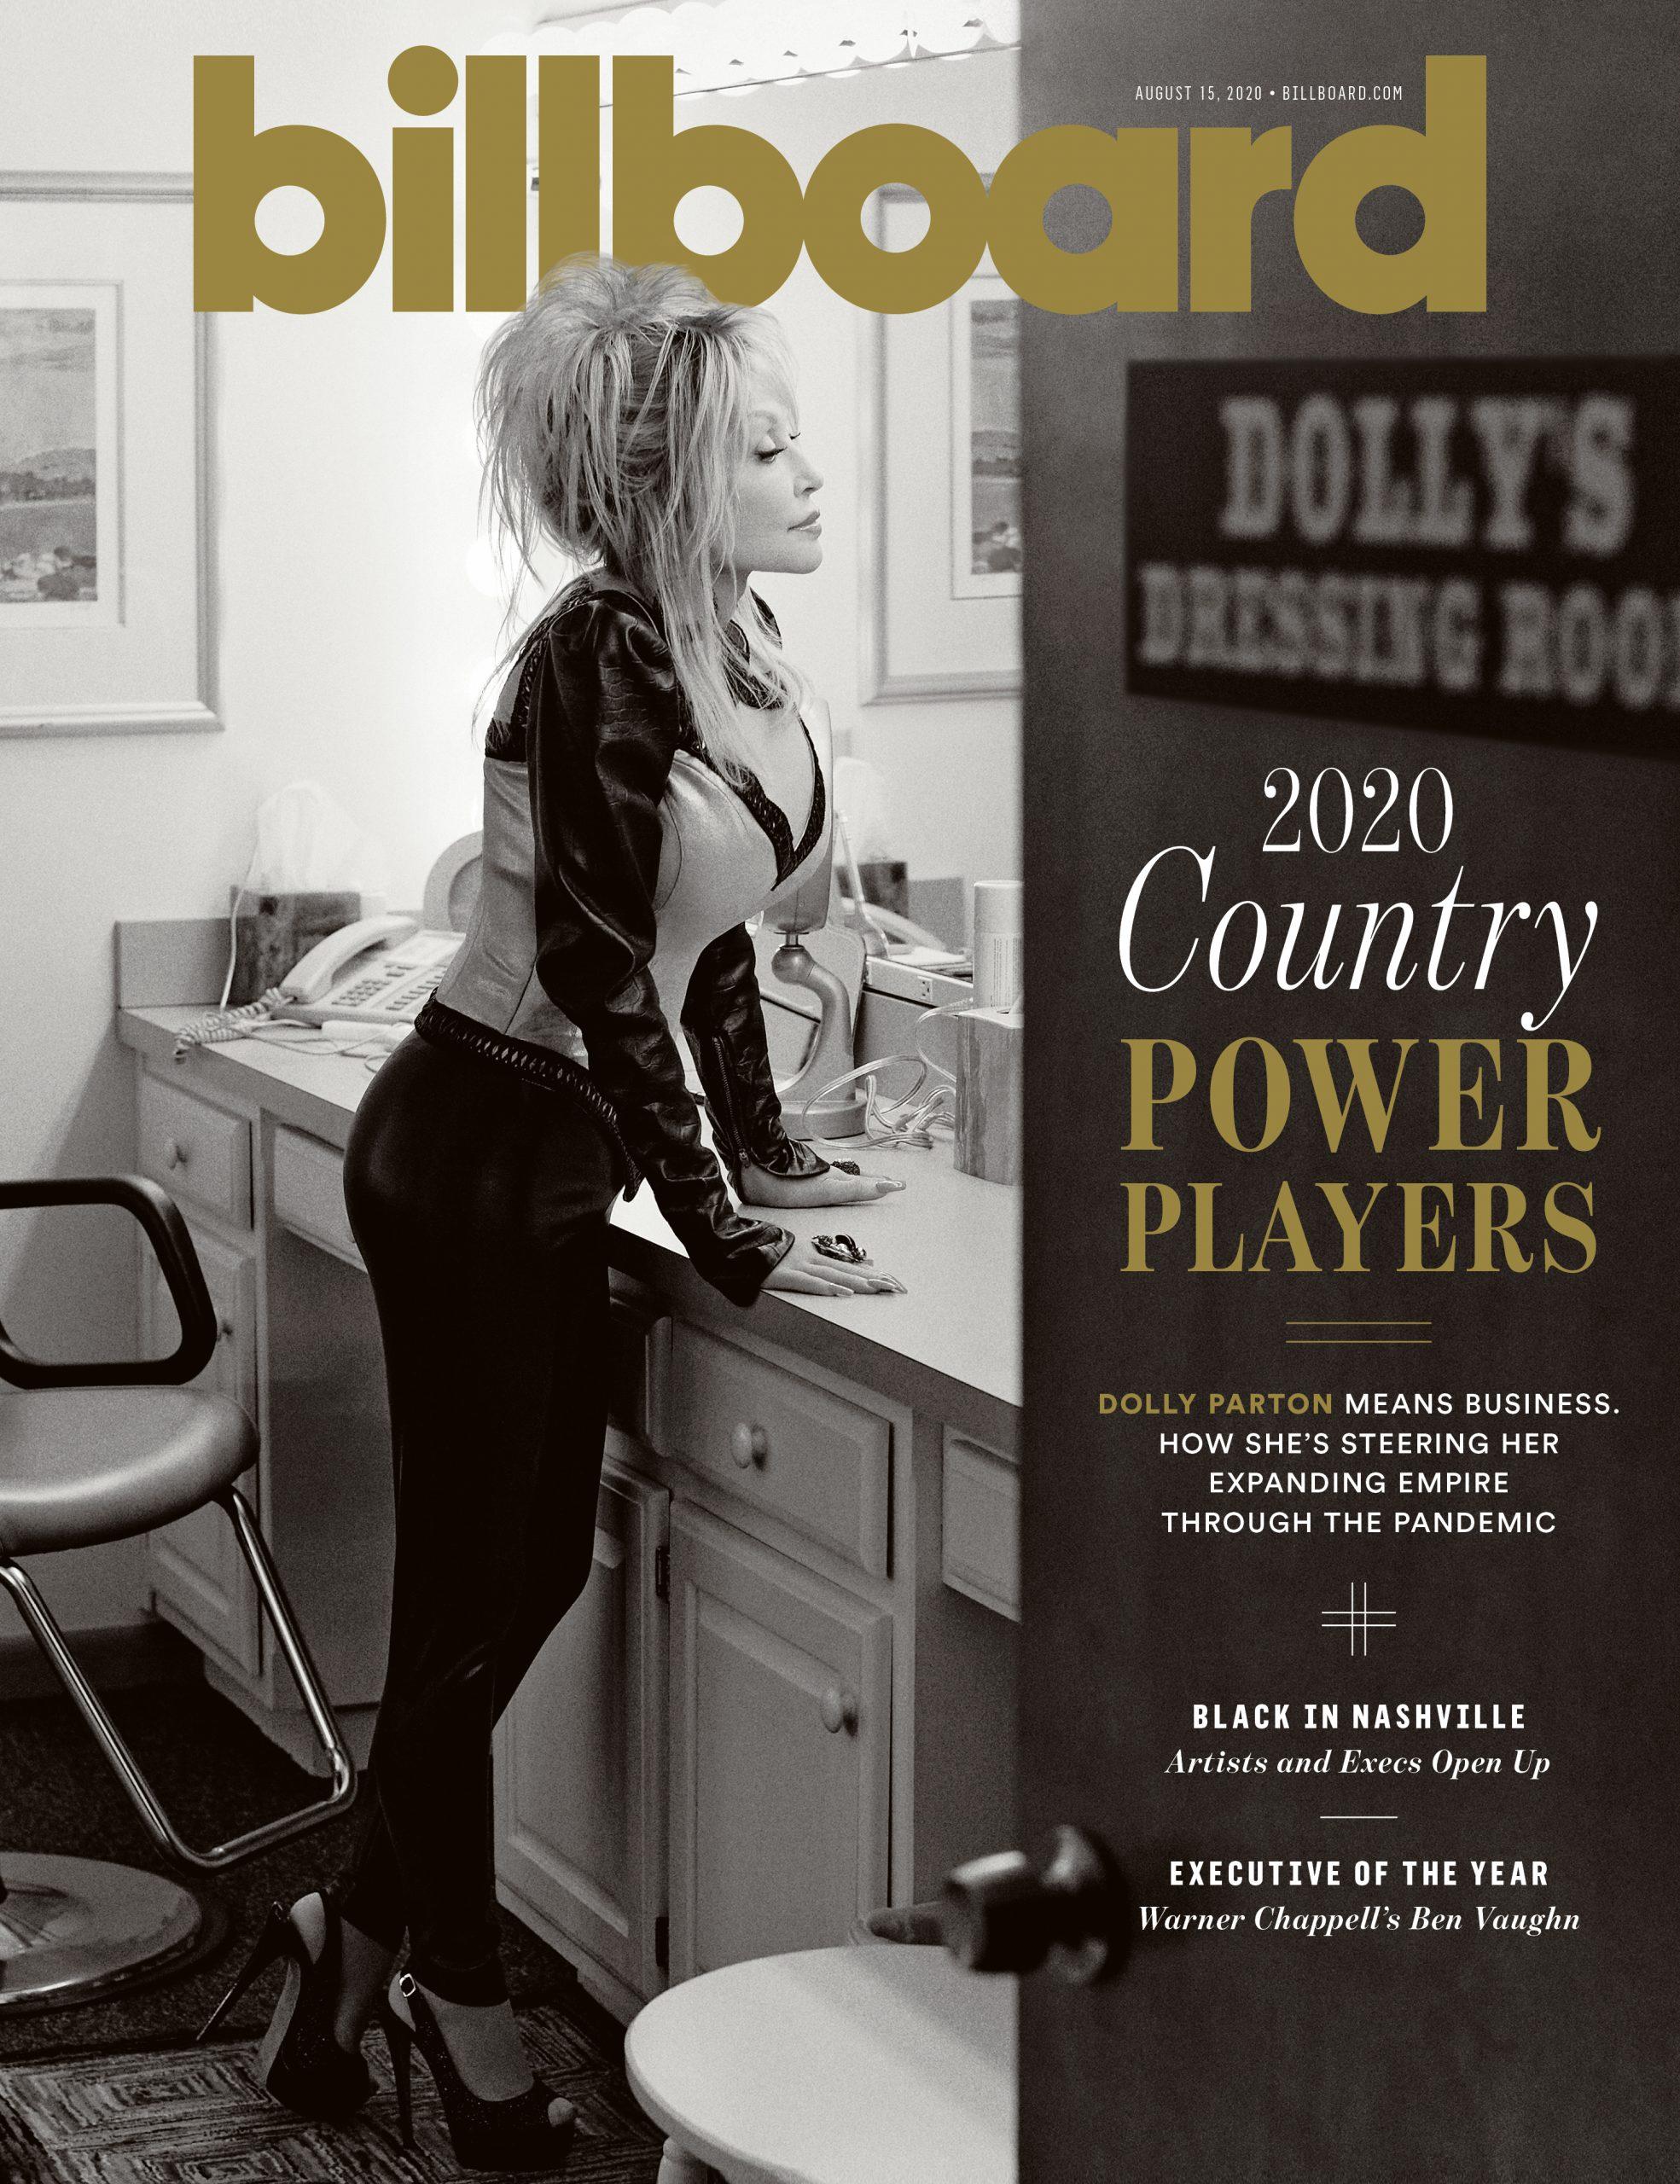 Dolly Parton's Billboard Cover